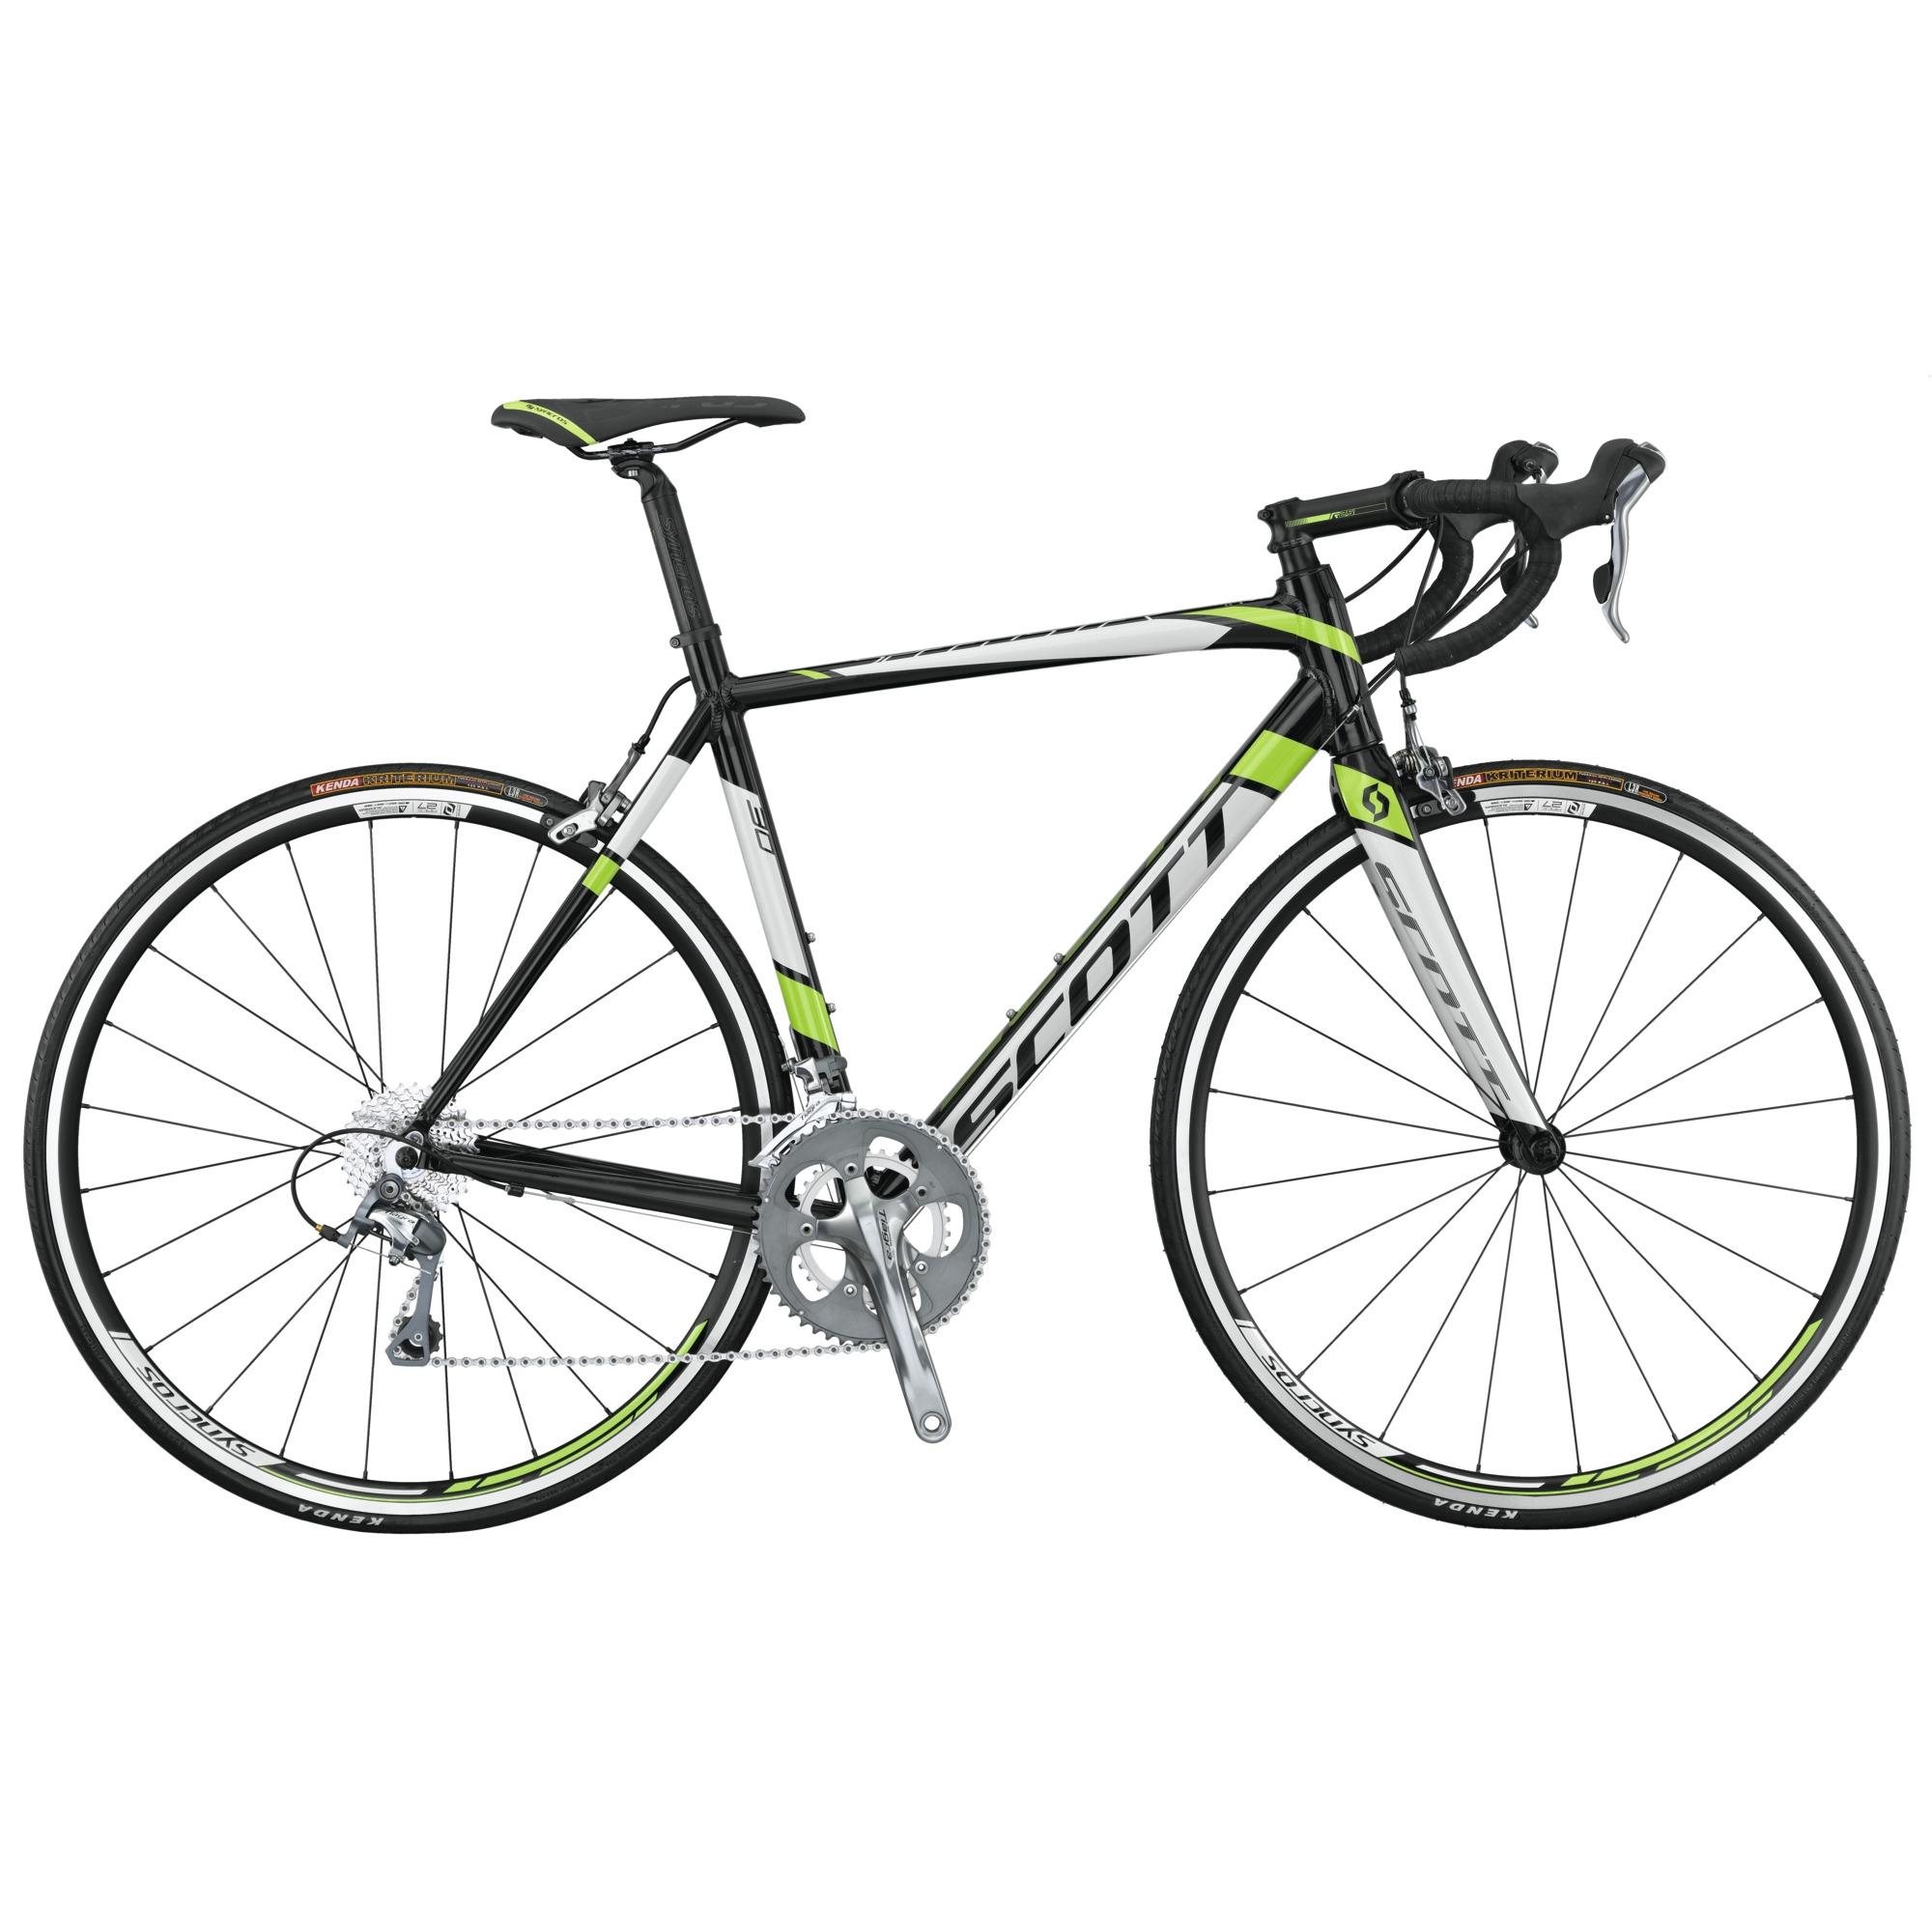 Scott Speedster 30 Mens Road Bike £749.00